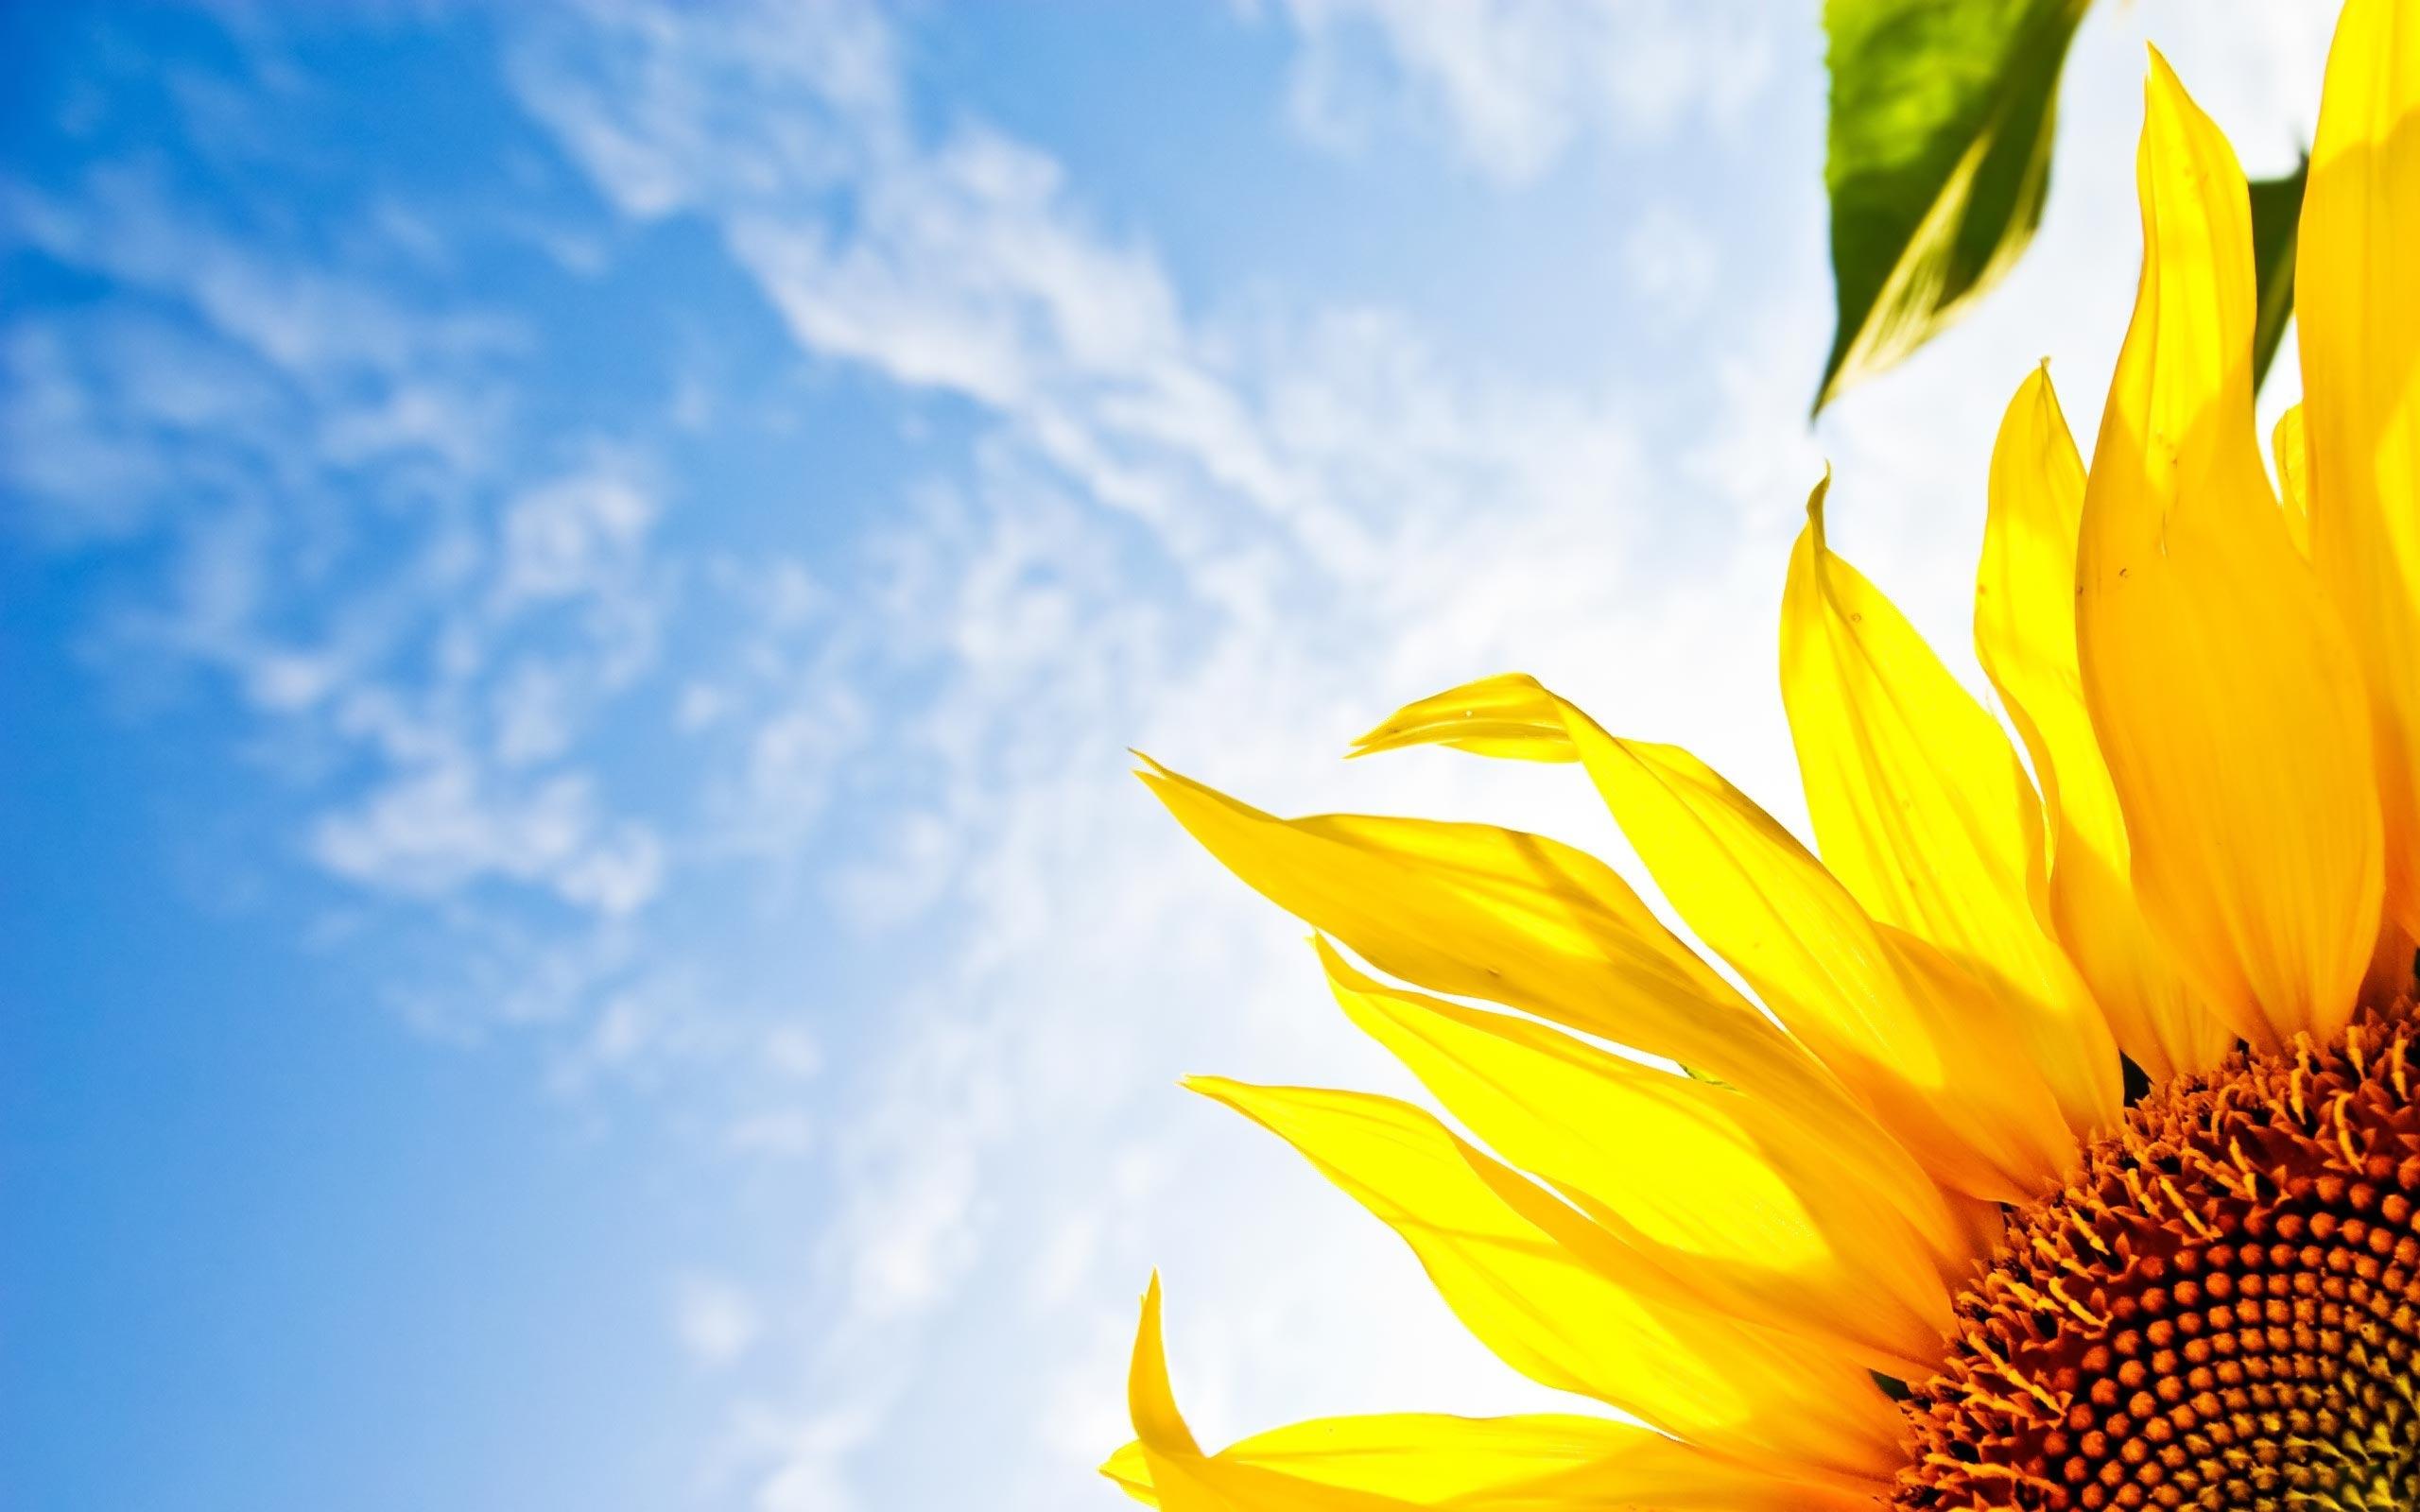 Desktop Wallpaper Gallery Windows Sky Sunflower Free